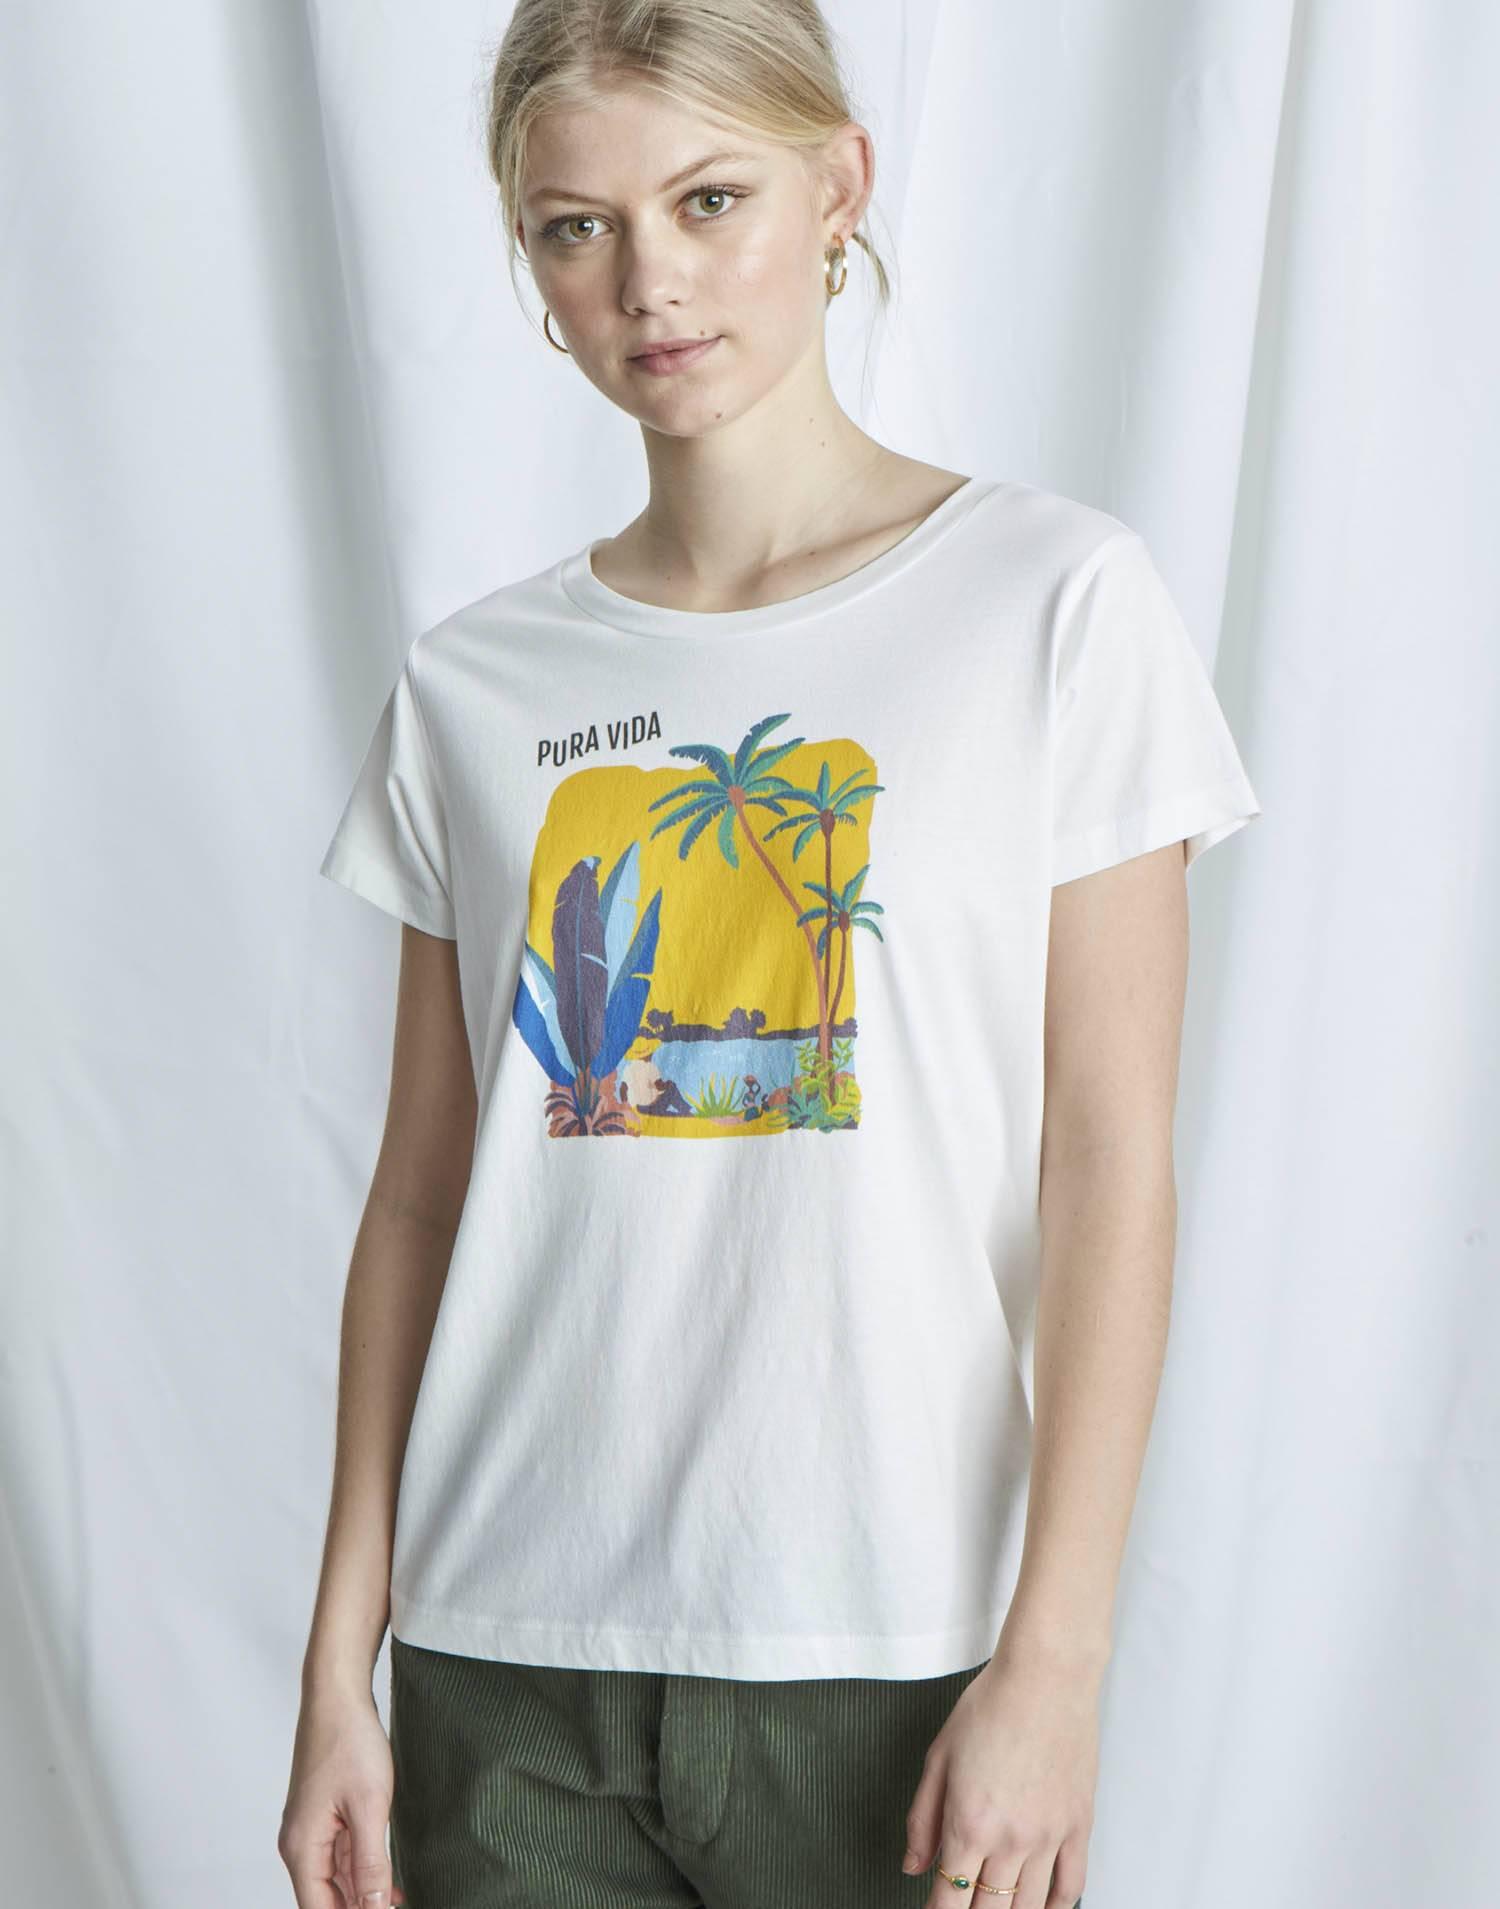 Camiseta orgánica pura vida